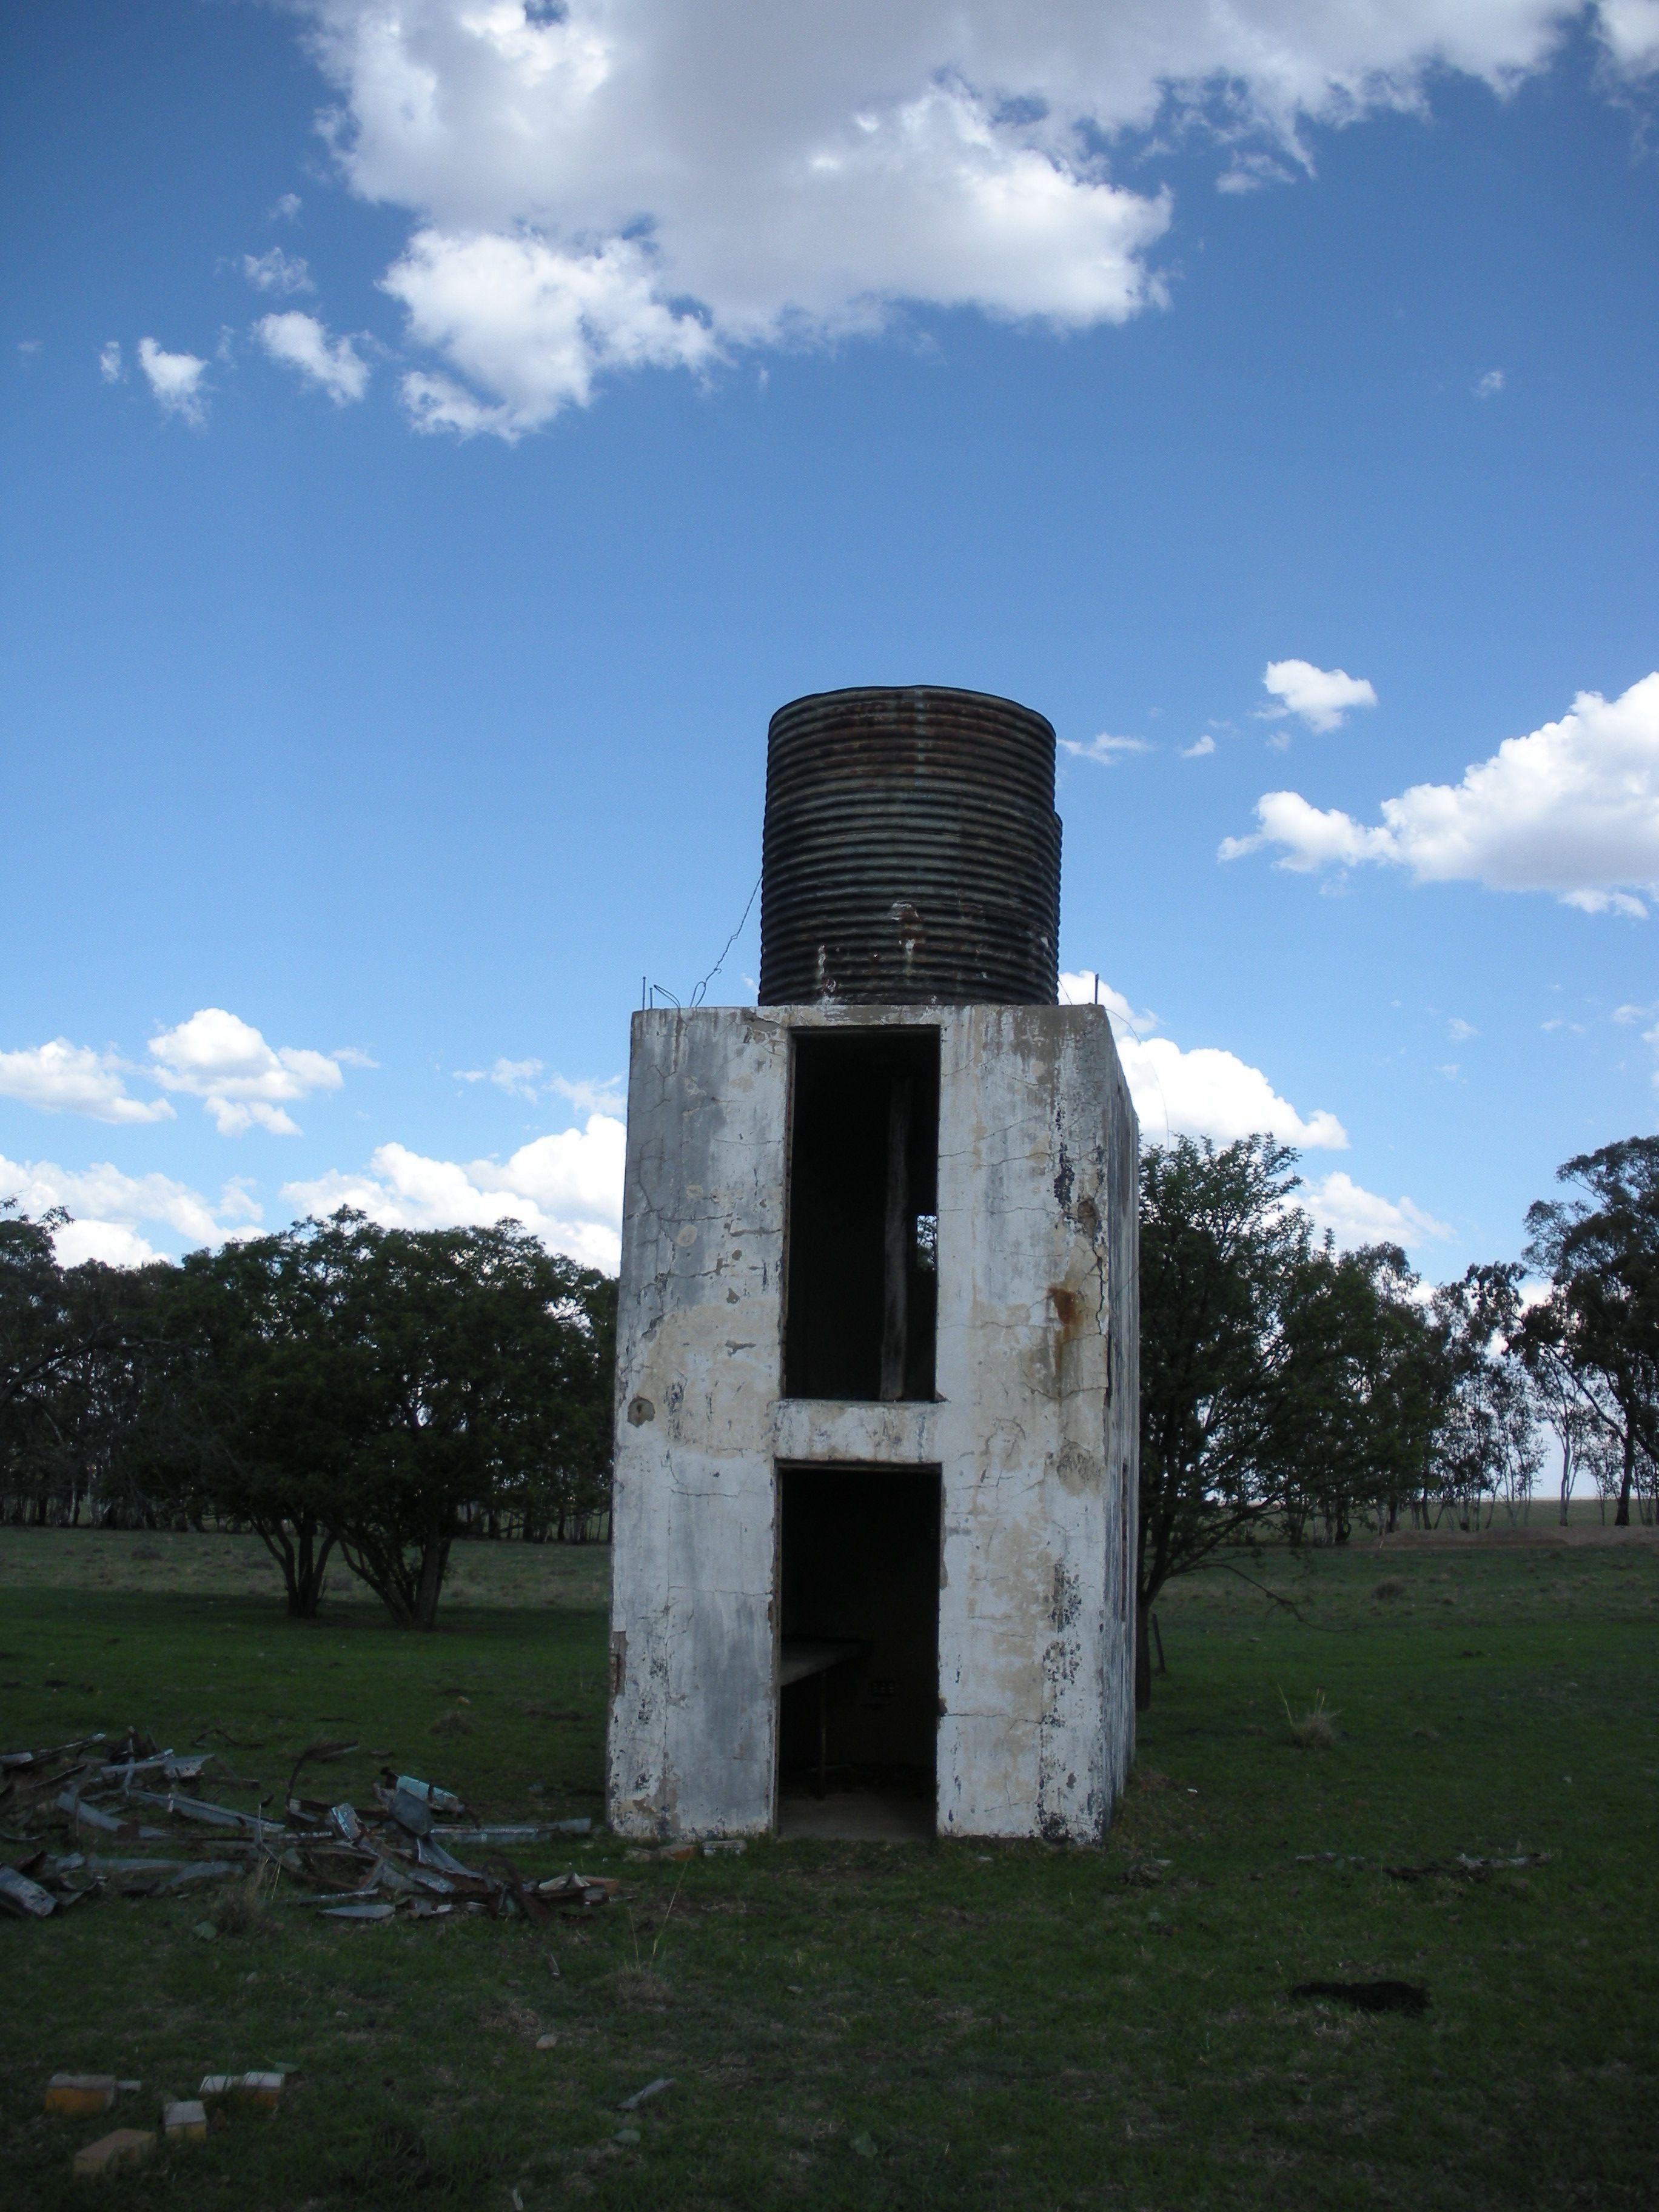 Abandoned water tank house on a friend's farm, Parys